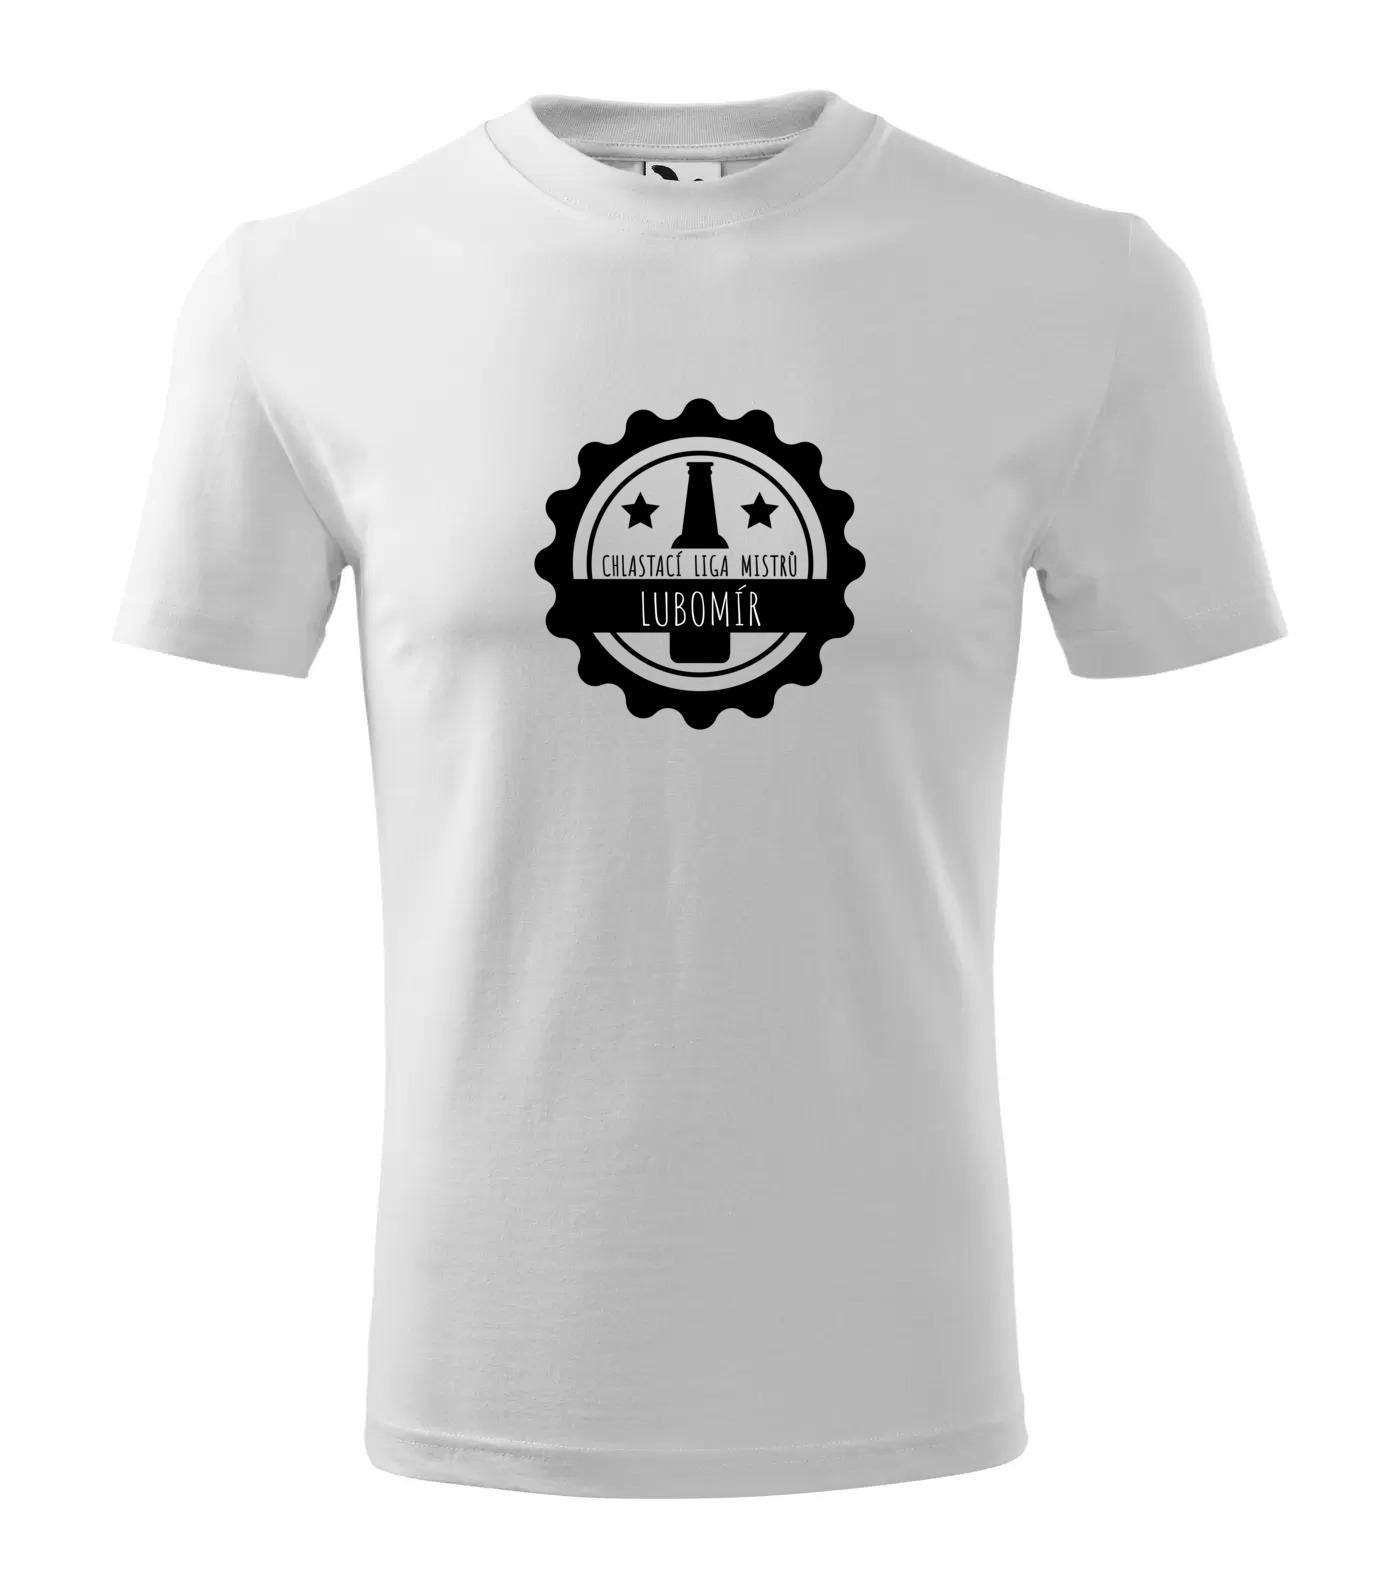 Tričko Chlastací liga mužů Lubomír